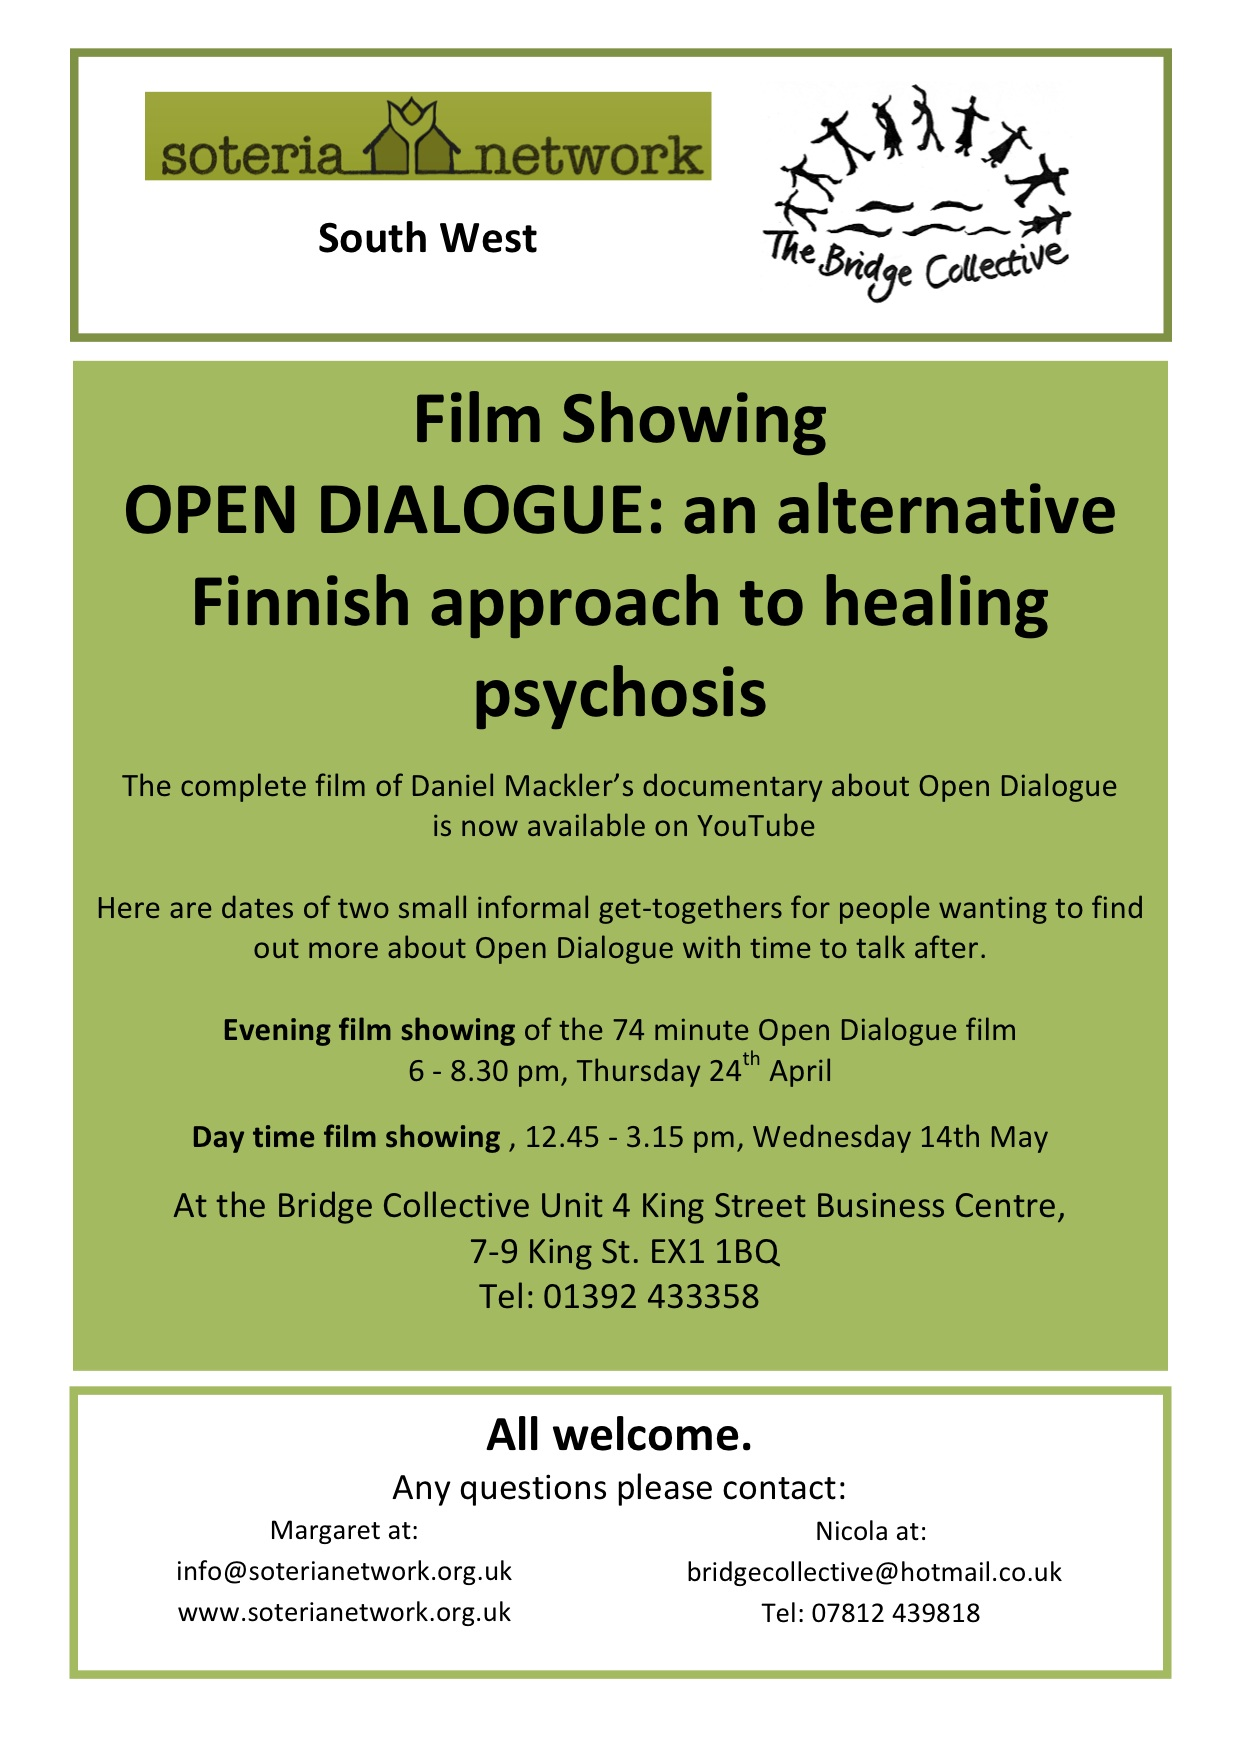 http://www.bridgecollective.org.uk/wp-content/uploads/2014/03/Film-Showing-Open-dialogue-poster-colour.jpg